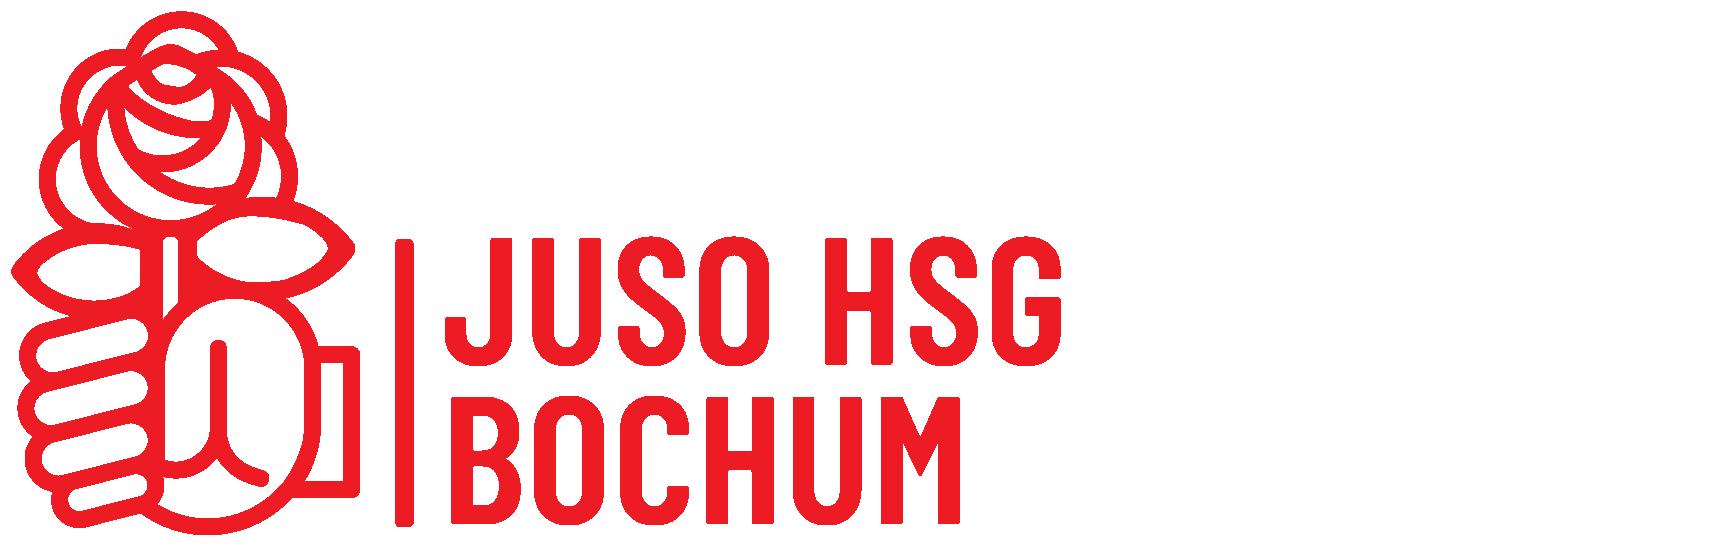 Juso-Hochuschulgruppe Bochum